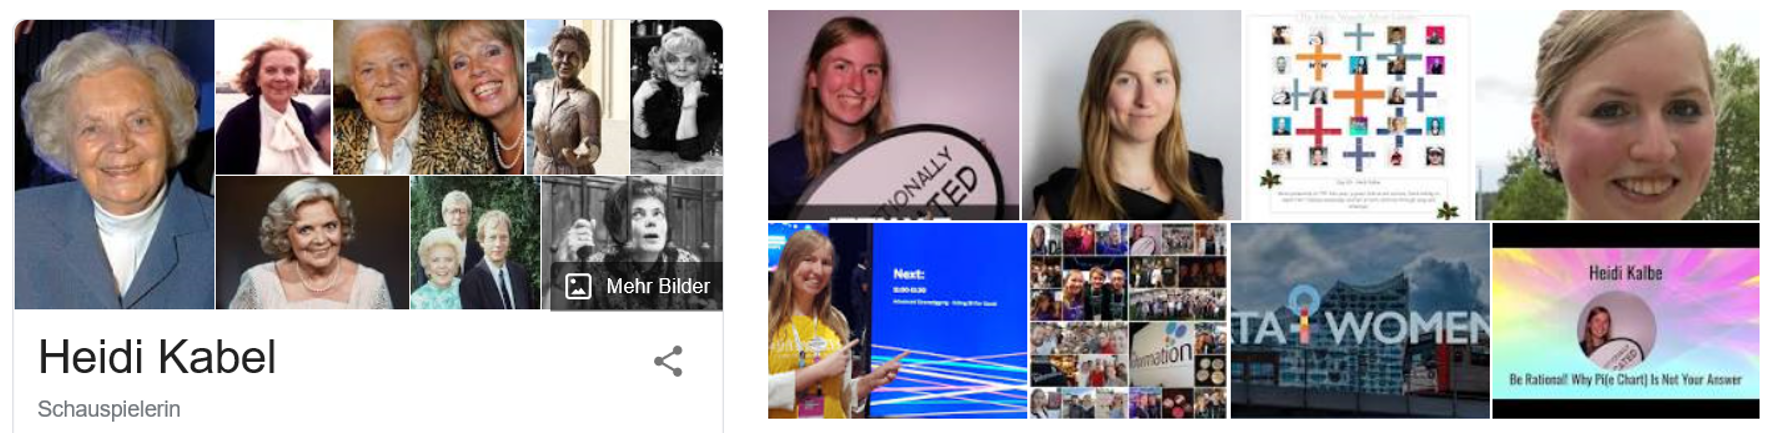 Google: Did you mean Heidi Kabel? No, I meant Heidi Kalbe.